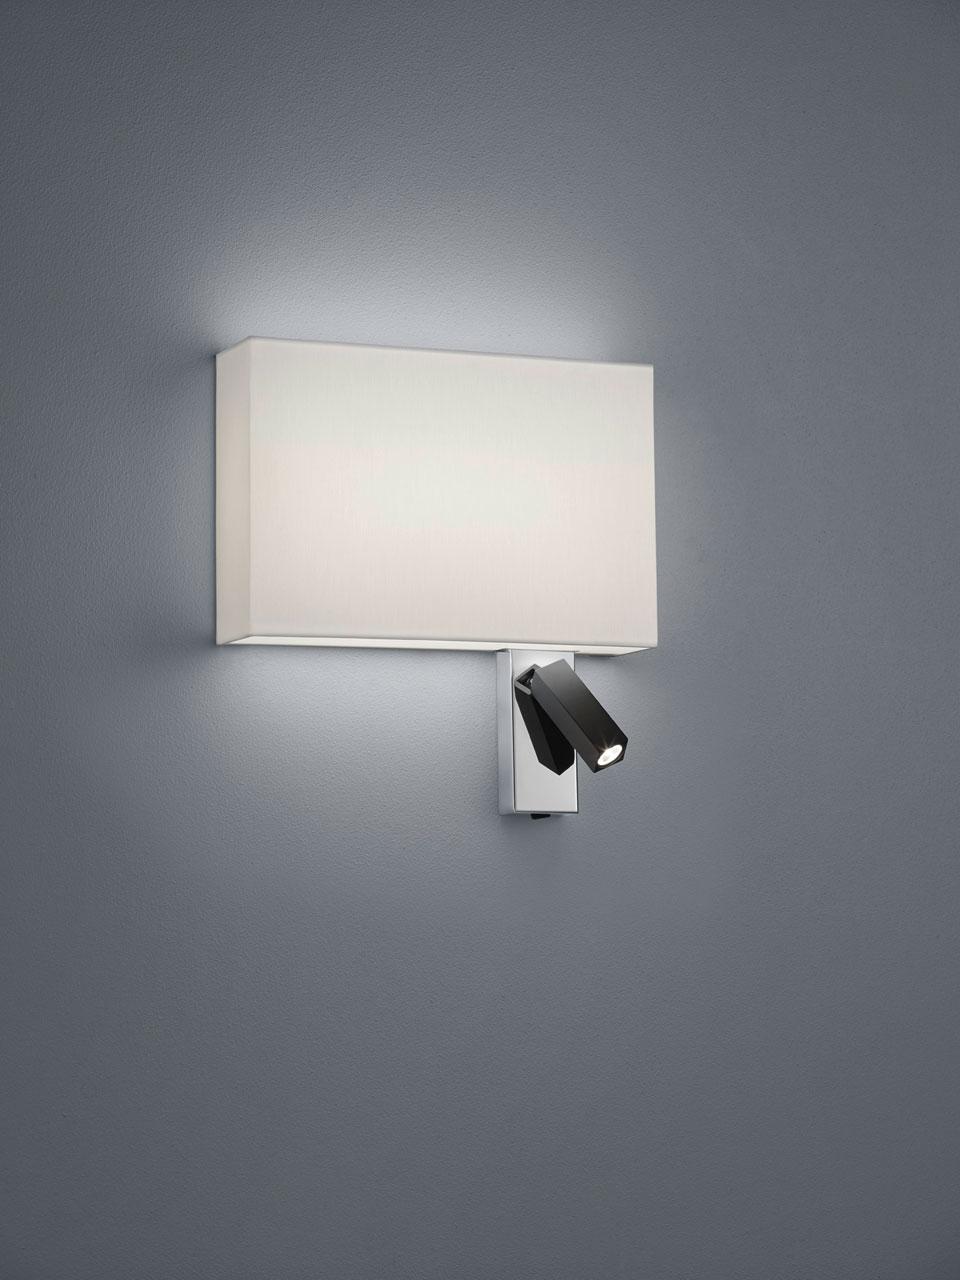 Bedside Wall Lamp Reading Lamp Rectangle Shade Baulmann Leuchten Luxury Lightings Made In Germany Ref 17110008